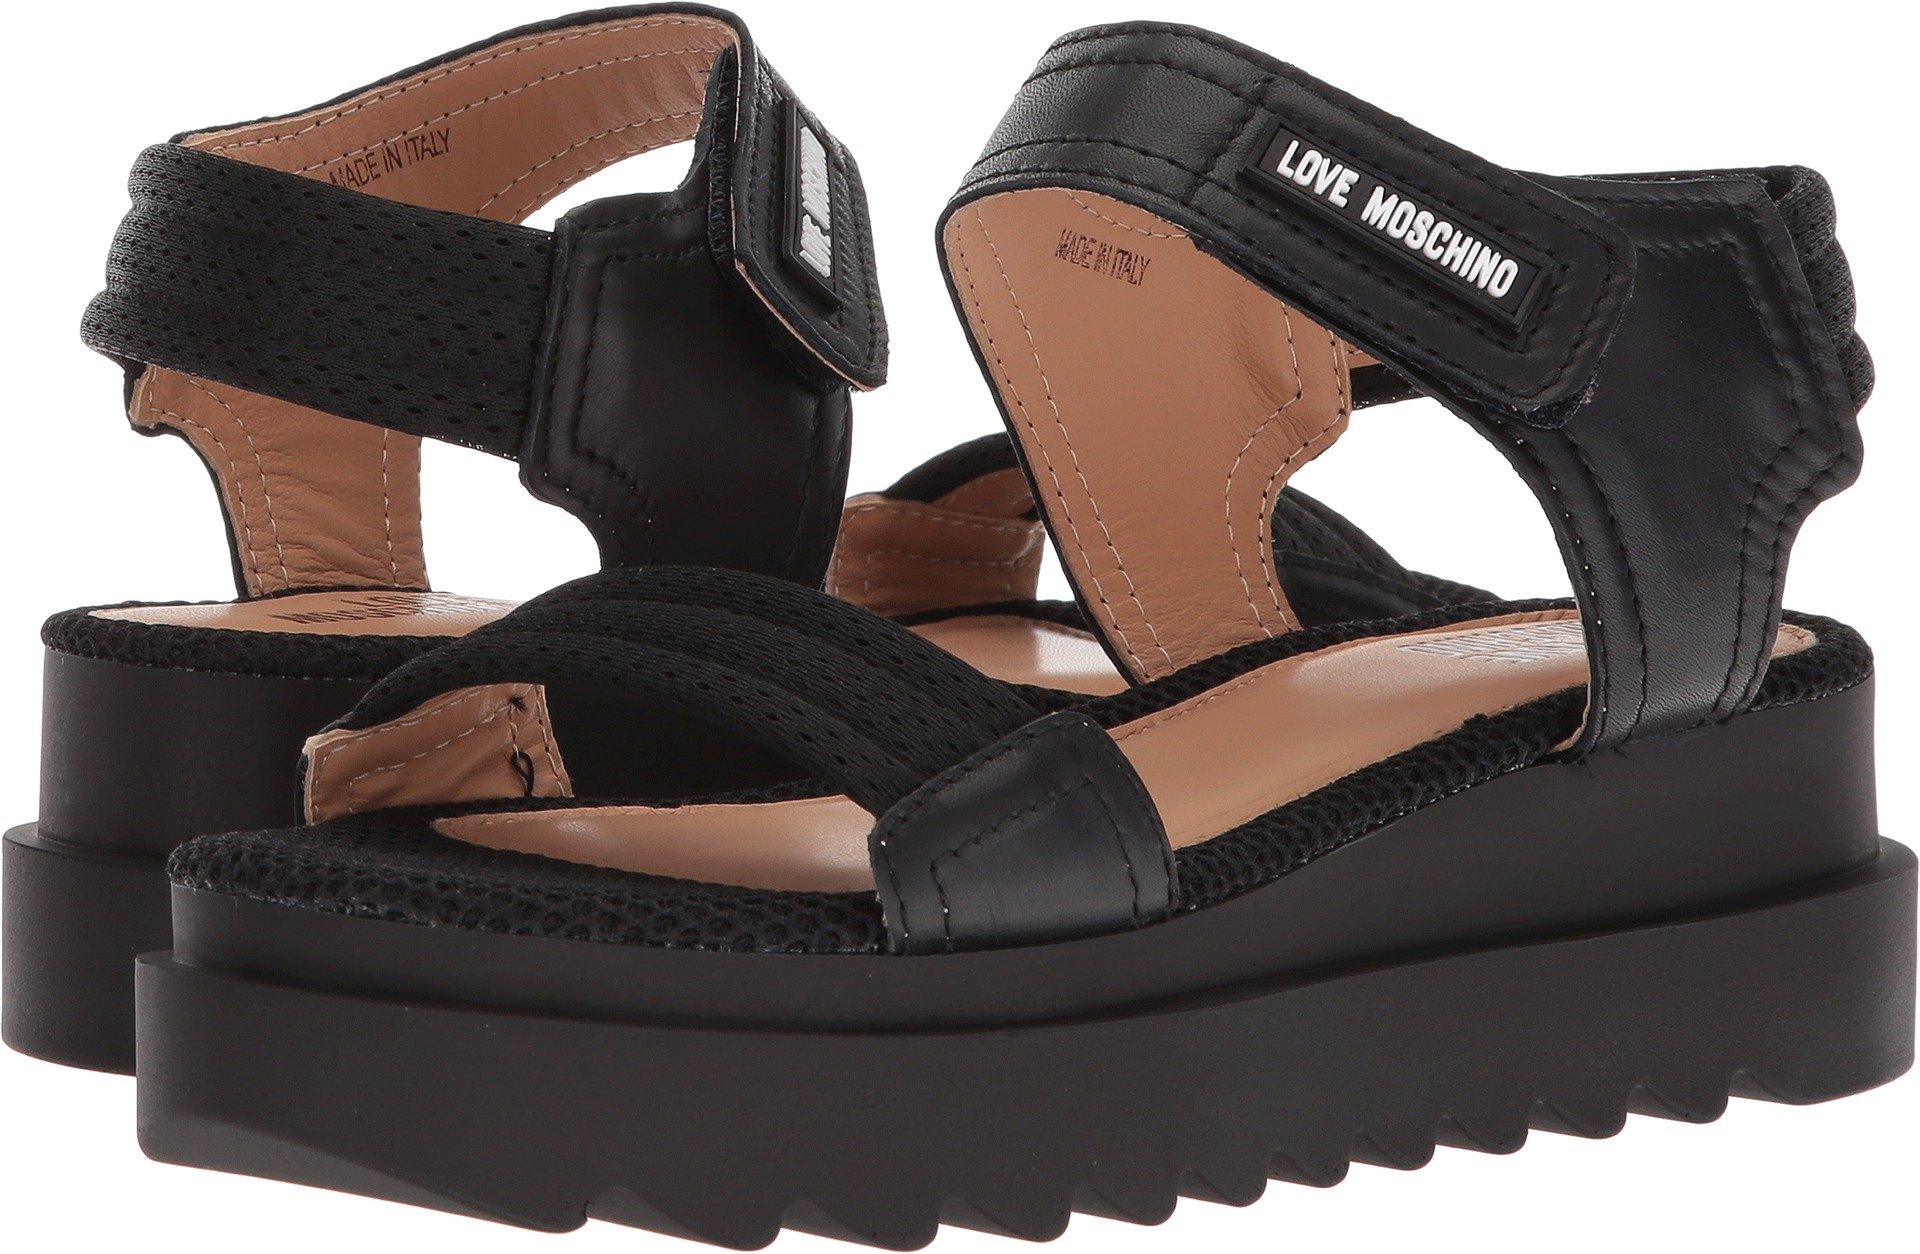 Love Moschino Women's Mesh Sandal Black 35 M EU by Love Moschino (Image #1)